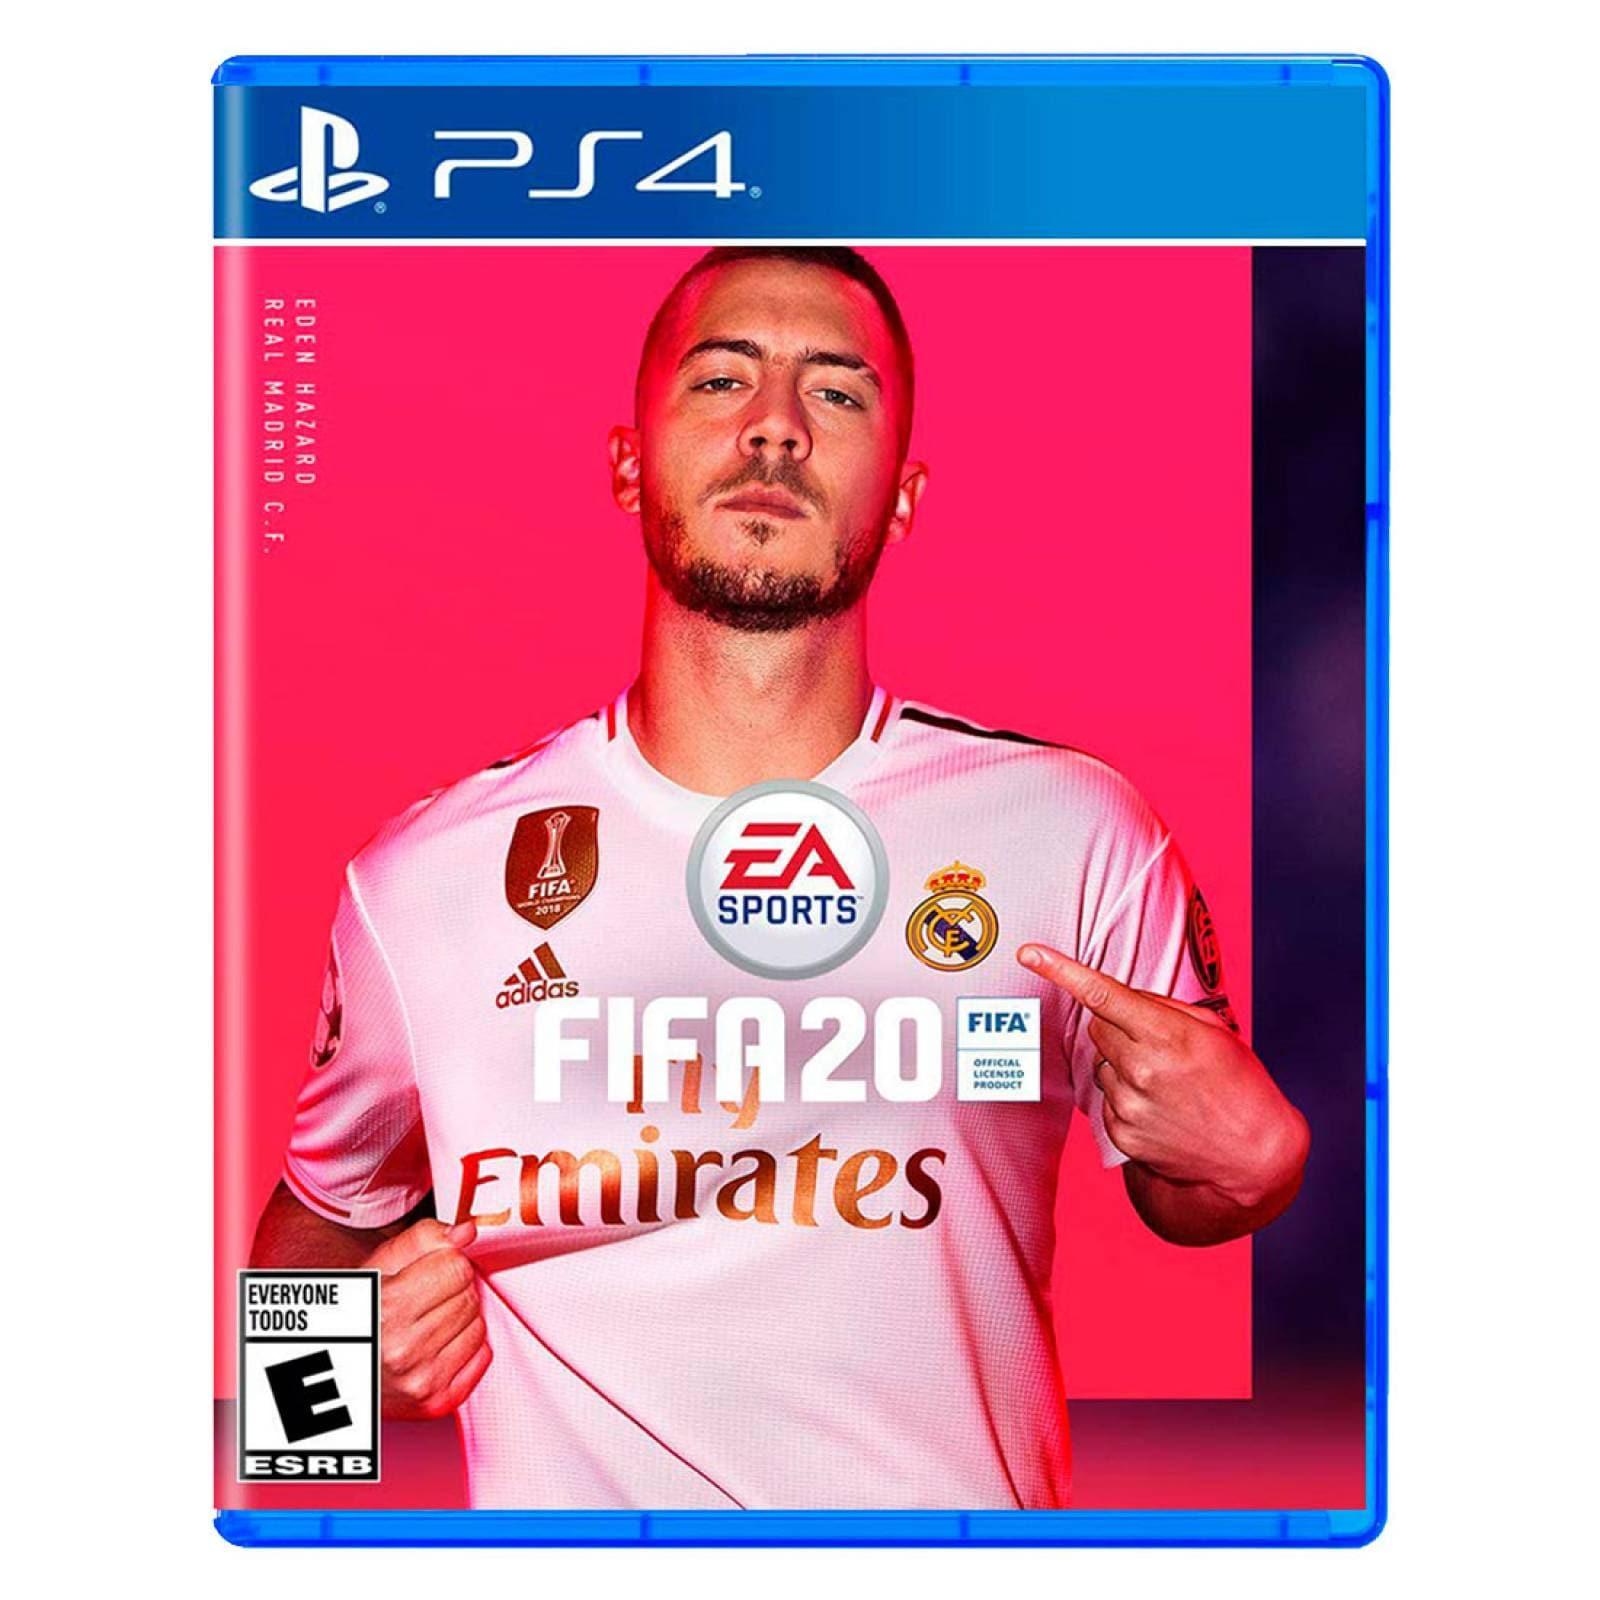 Juego PS4 FIFA 20 Videojuego Deportes Play Station 4